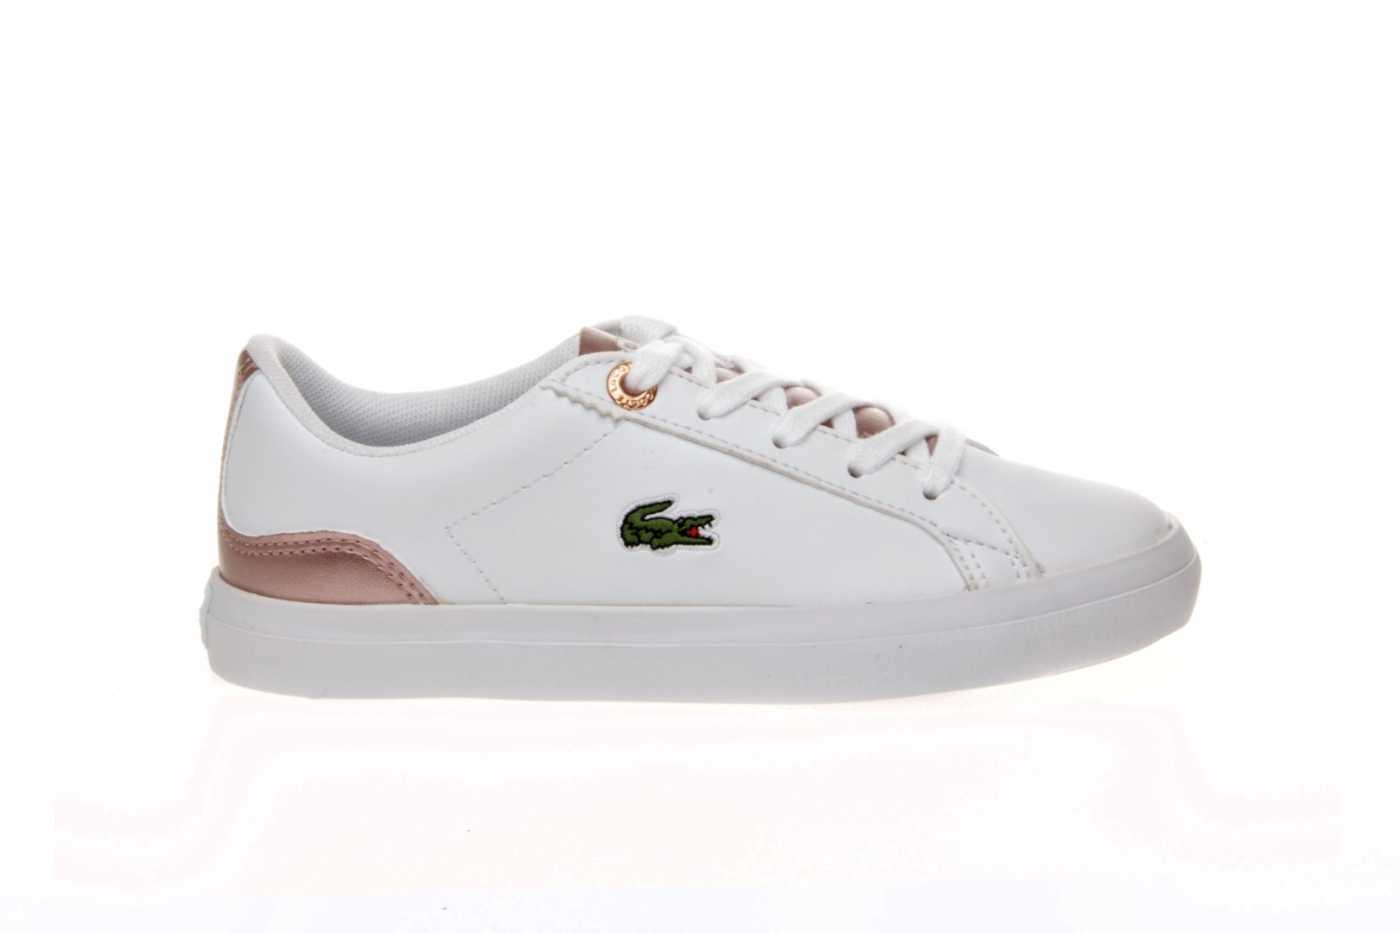 Comprar zapato tipo JOVEN NIÑA estilo DEPORTIVO COLOR ROSA PIEL ... 526f90e9c7